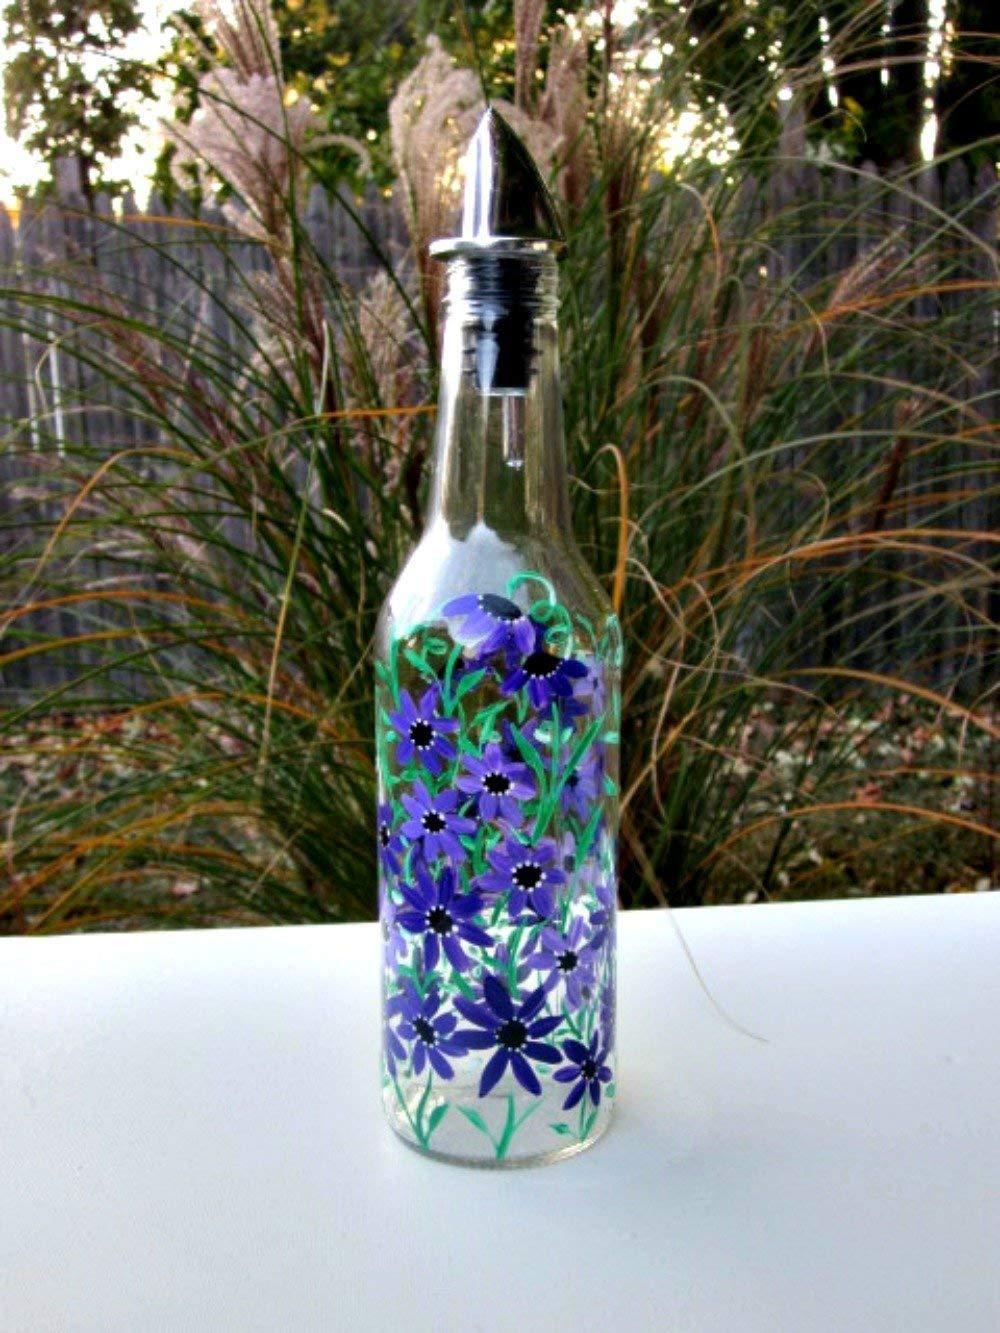 Dish Soap Dispenser, Oil and Vinegar Bottle, Hand Painted Glass Bottle, Kitchen Decoration, Purple Flowers